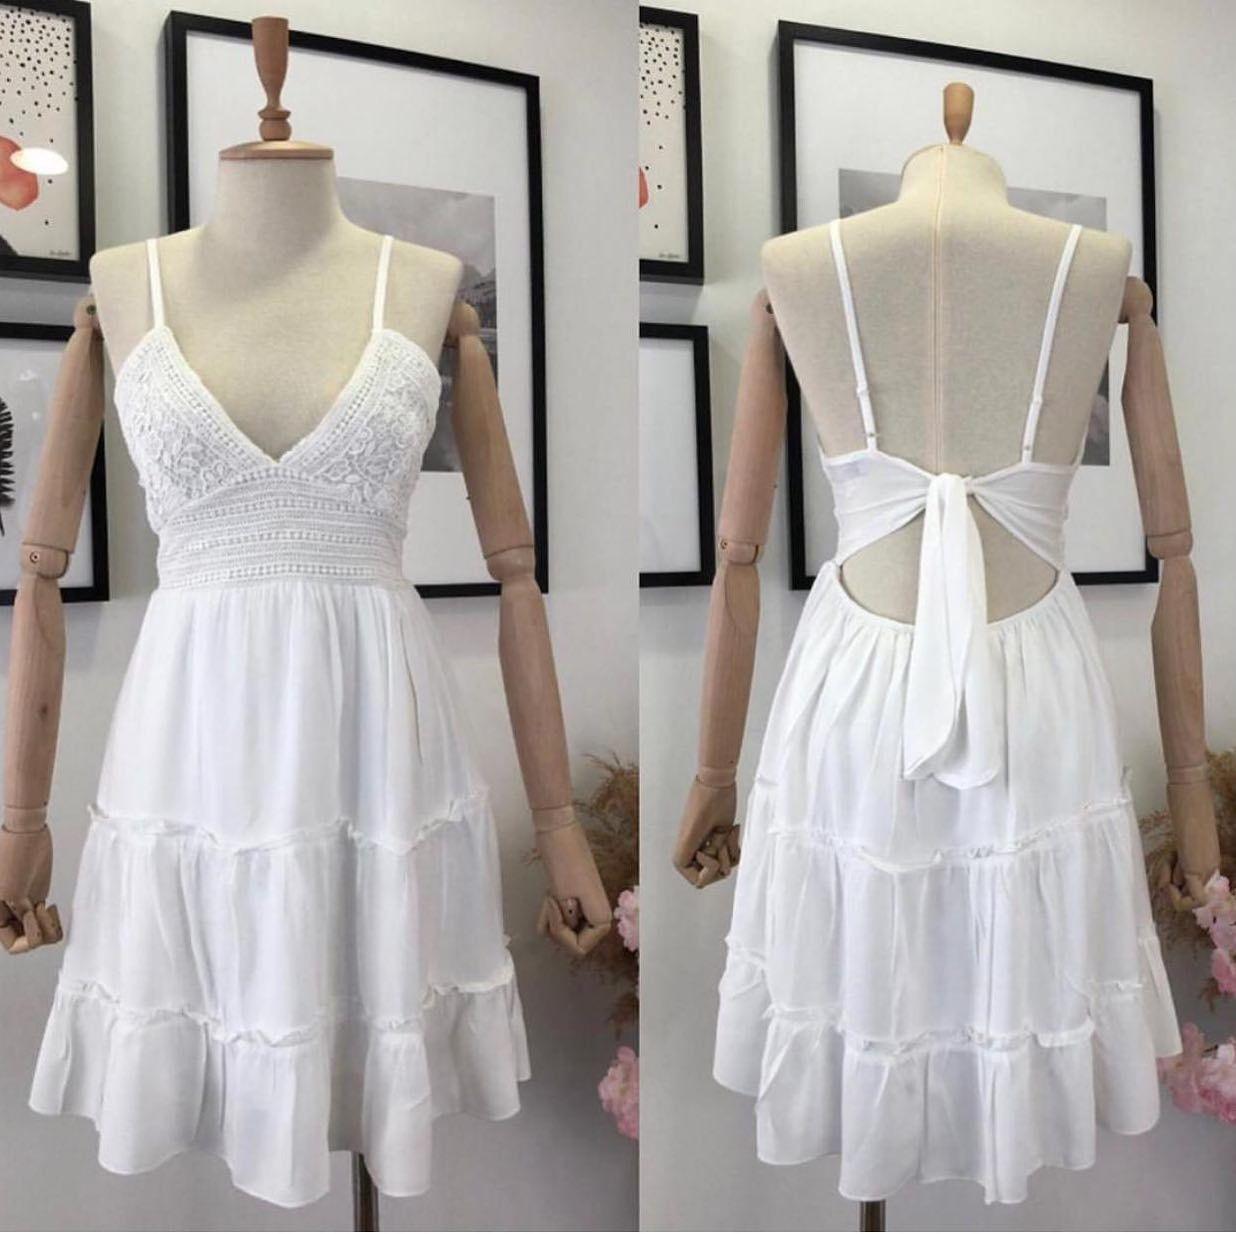 Dantel detay tasarım elbise Fiyat 120 tl S M L bedenler Siparis Whatsap İthal viskon kumas